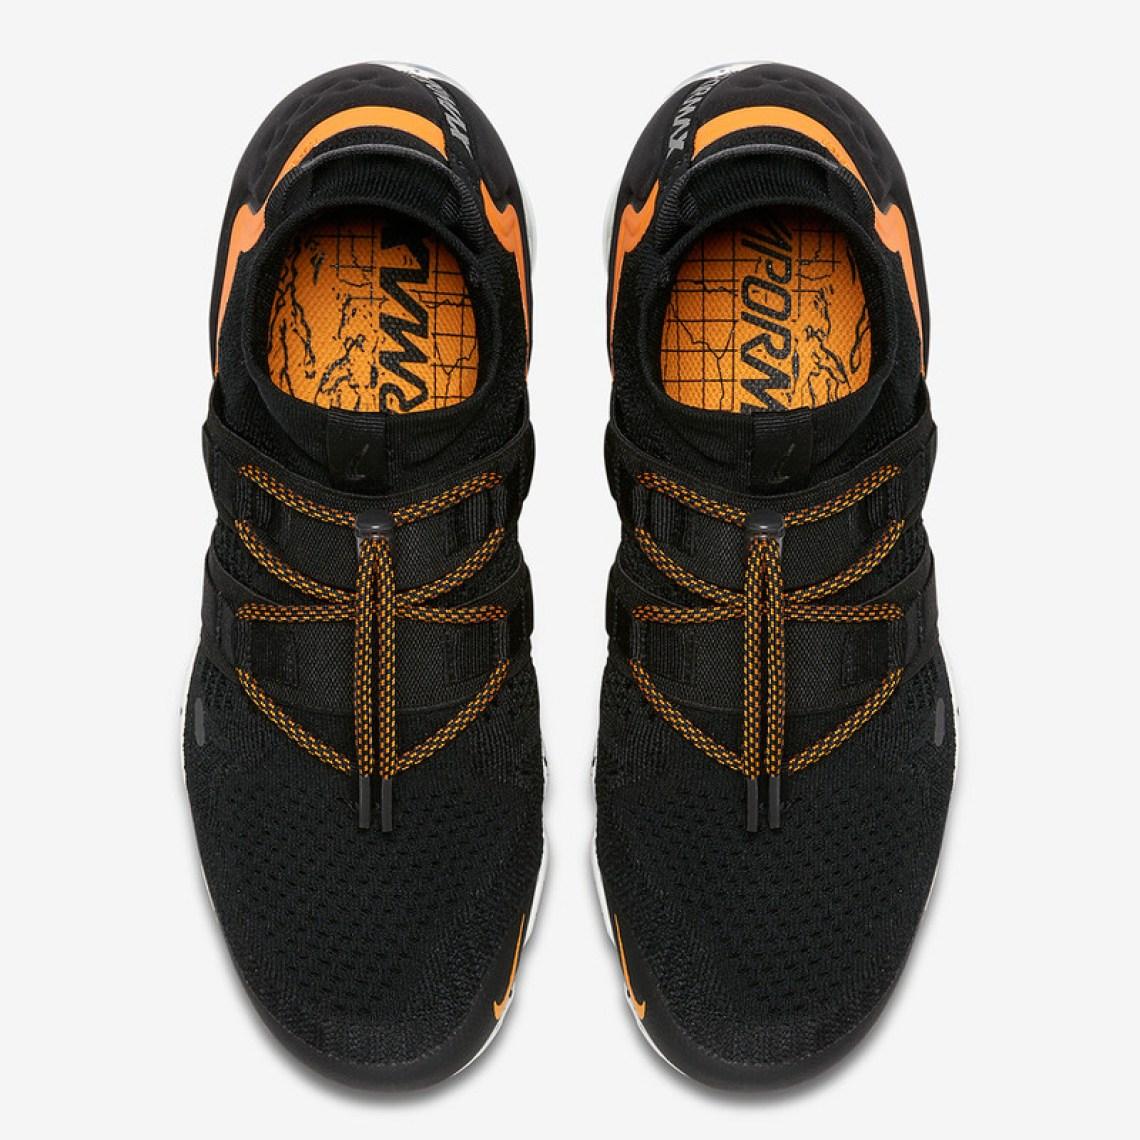 Nike Air VaporMax Utility Black/Orange Peel